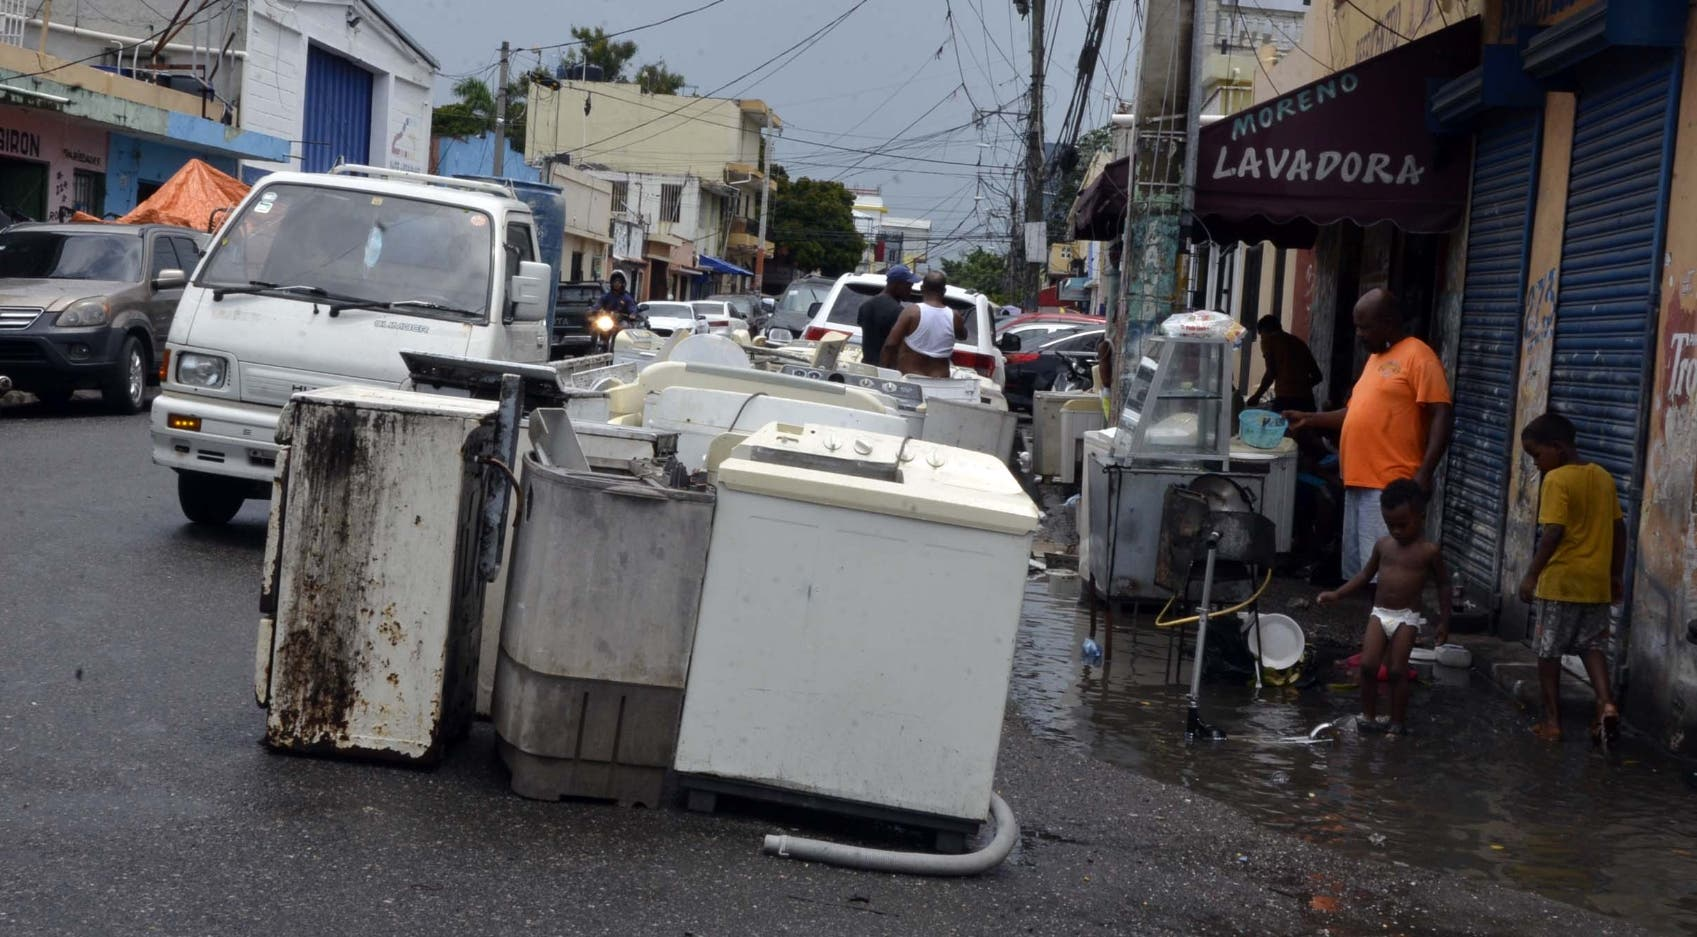 Desorden en calles de sectores populares se vuelve más agudo